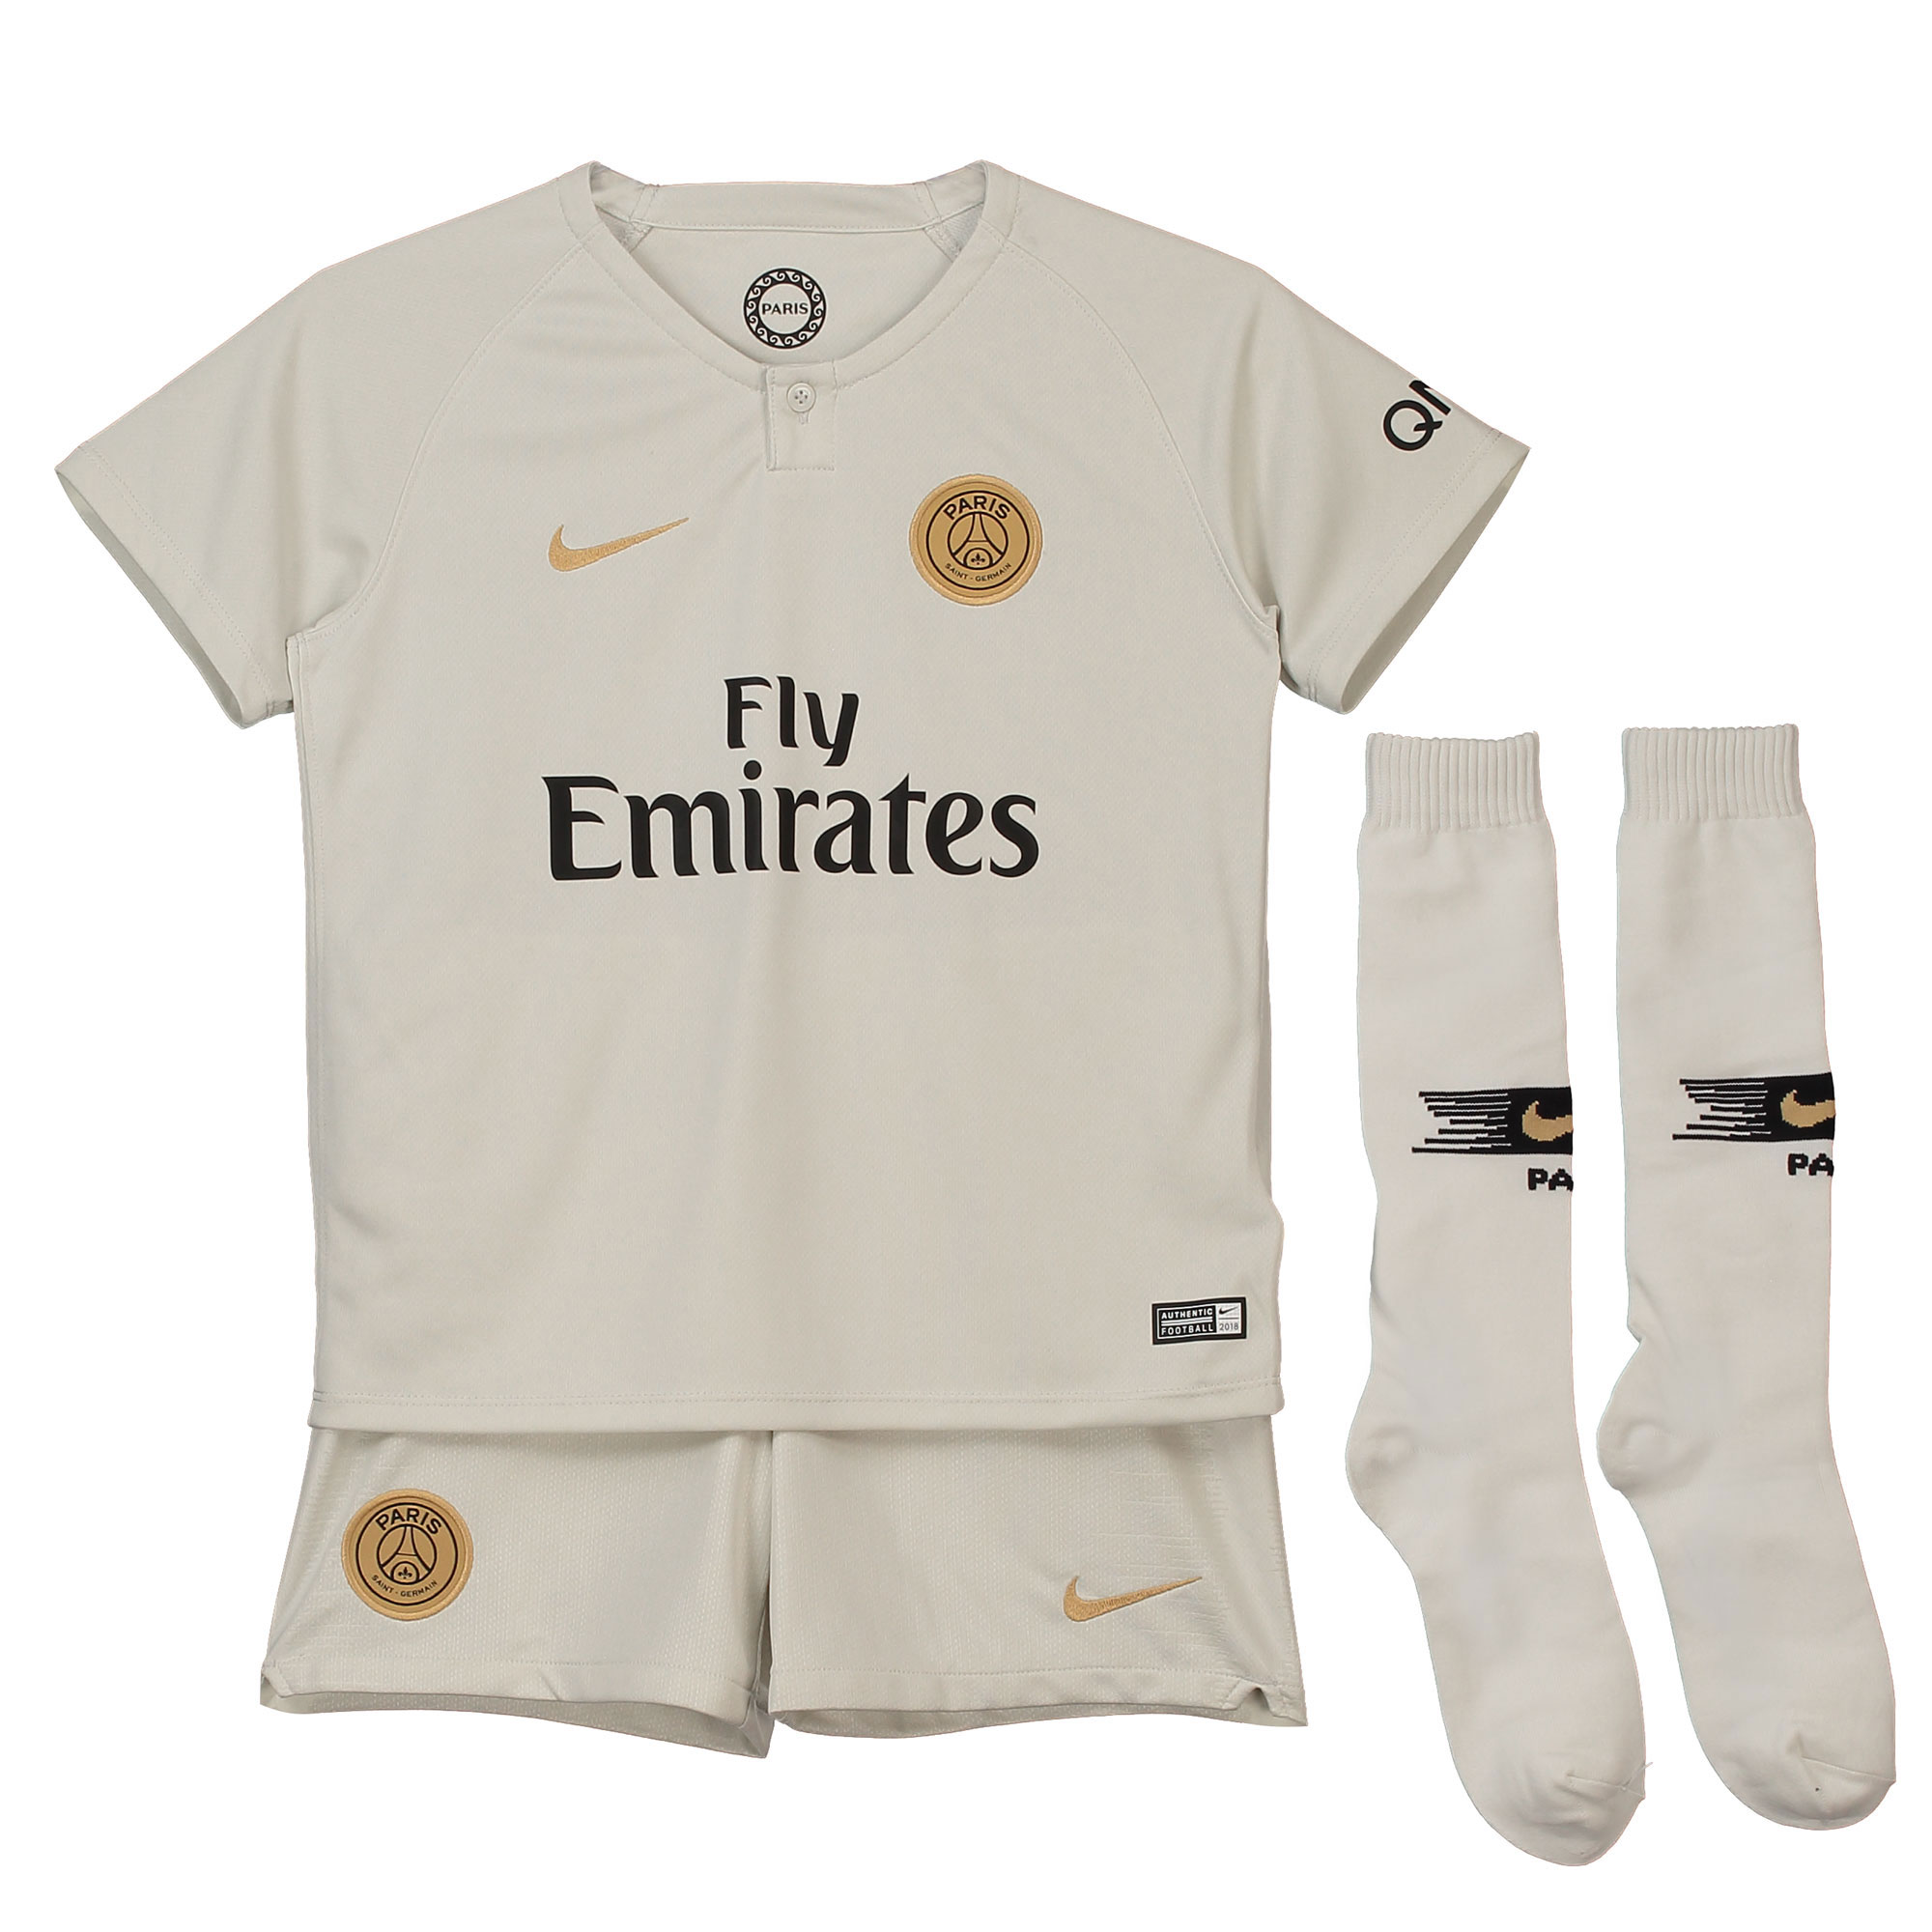 1b6ea481b57bb Futbalové kluby (všetky) | Nike Paris Saint-Germain FC - PSG set ...